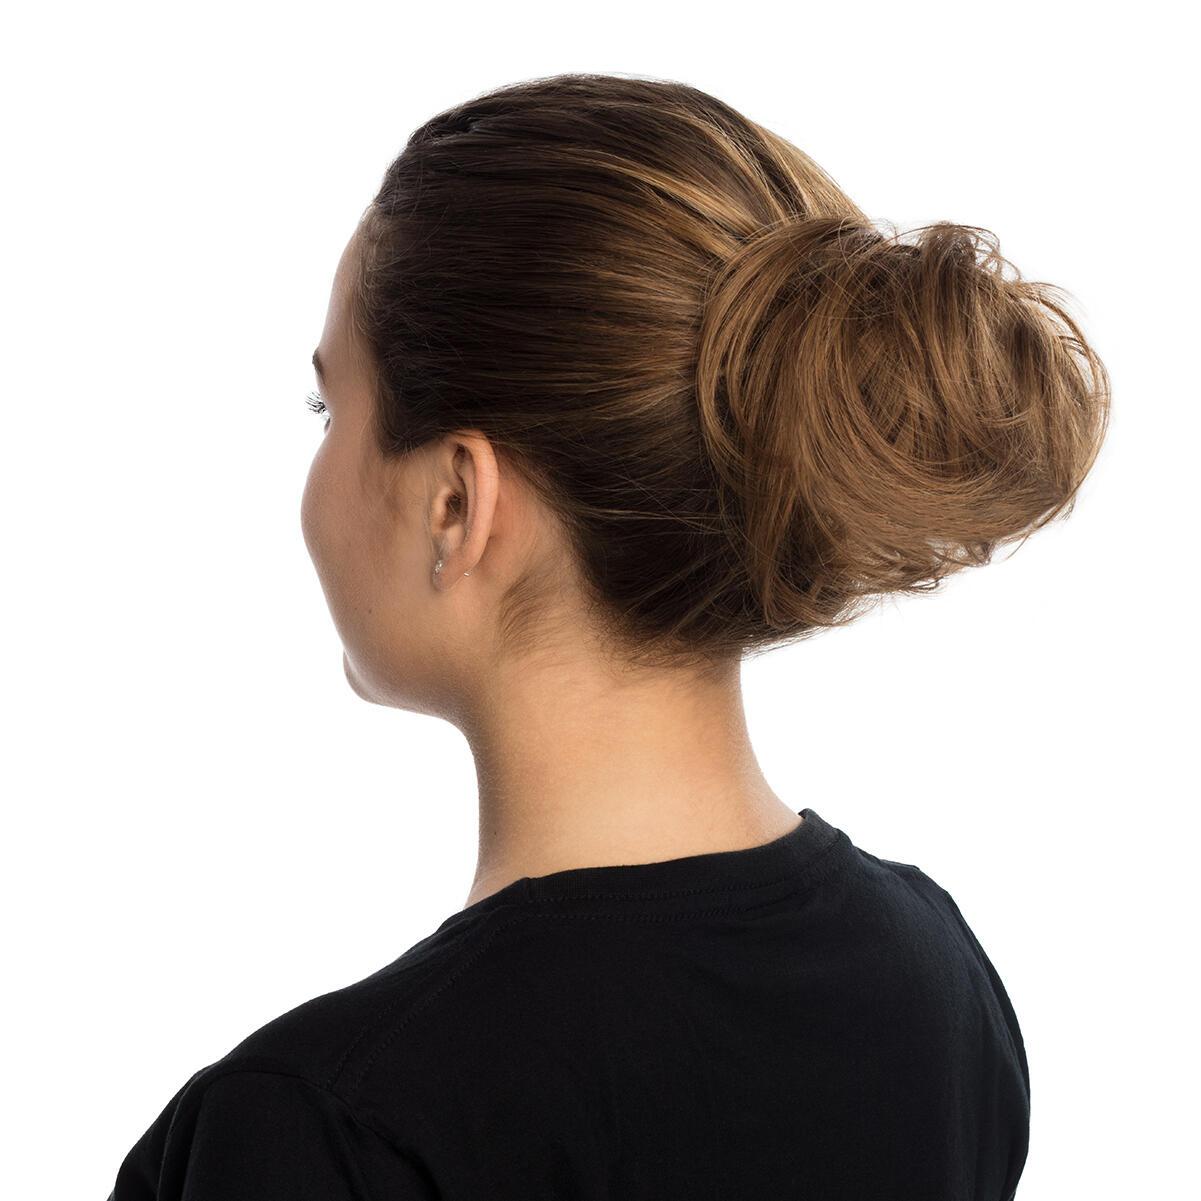 Hair Scrunchie 7.3 Cendre Ash 0 cm